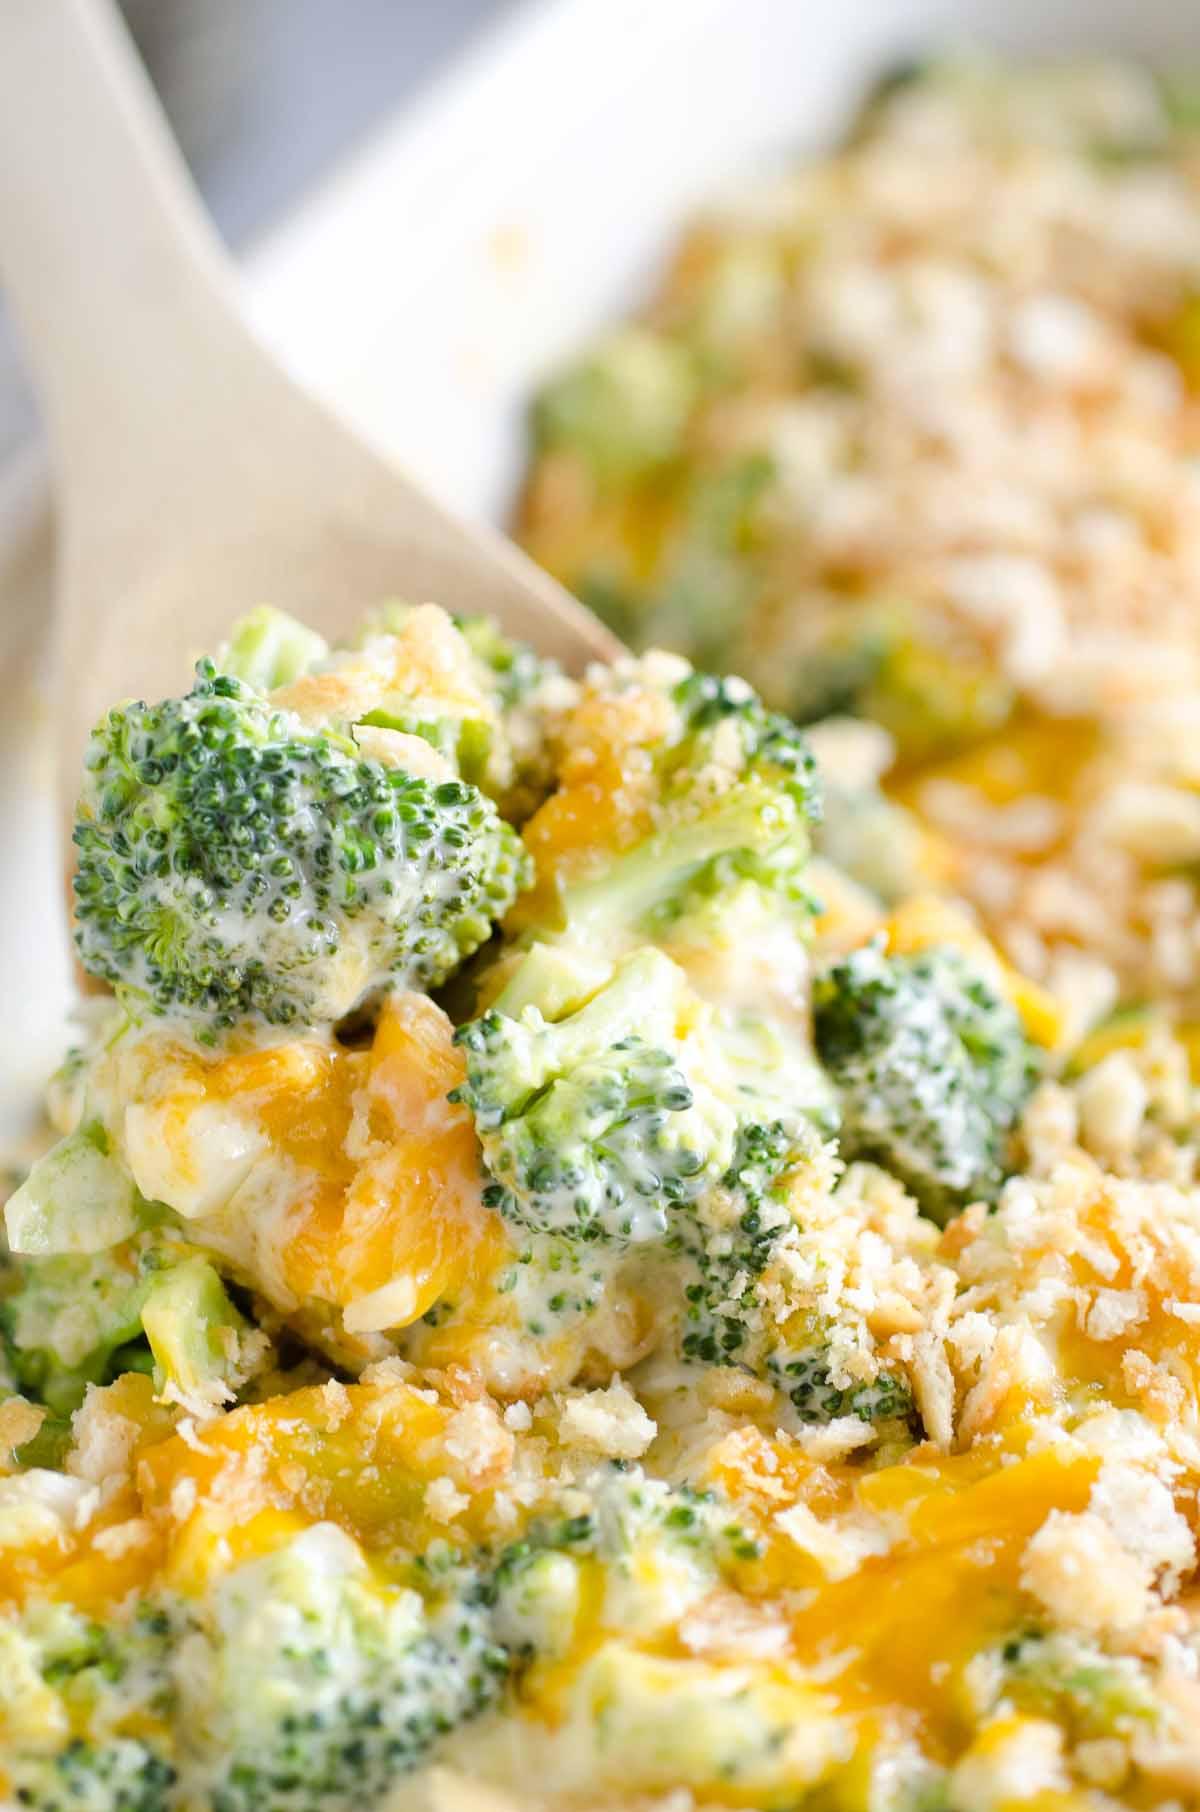 scoop of cheesy broccoli casserole